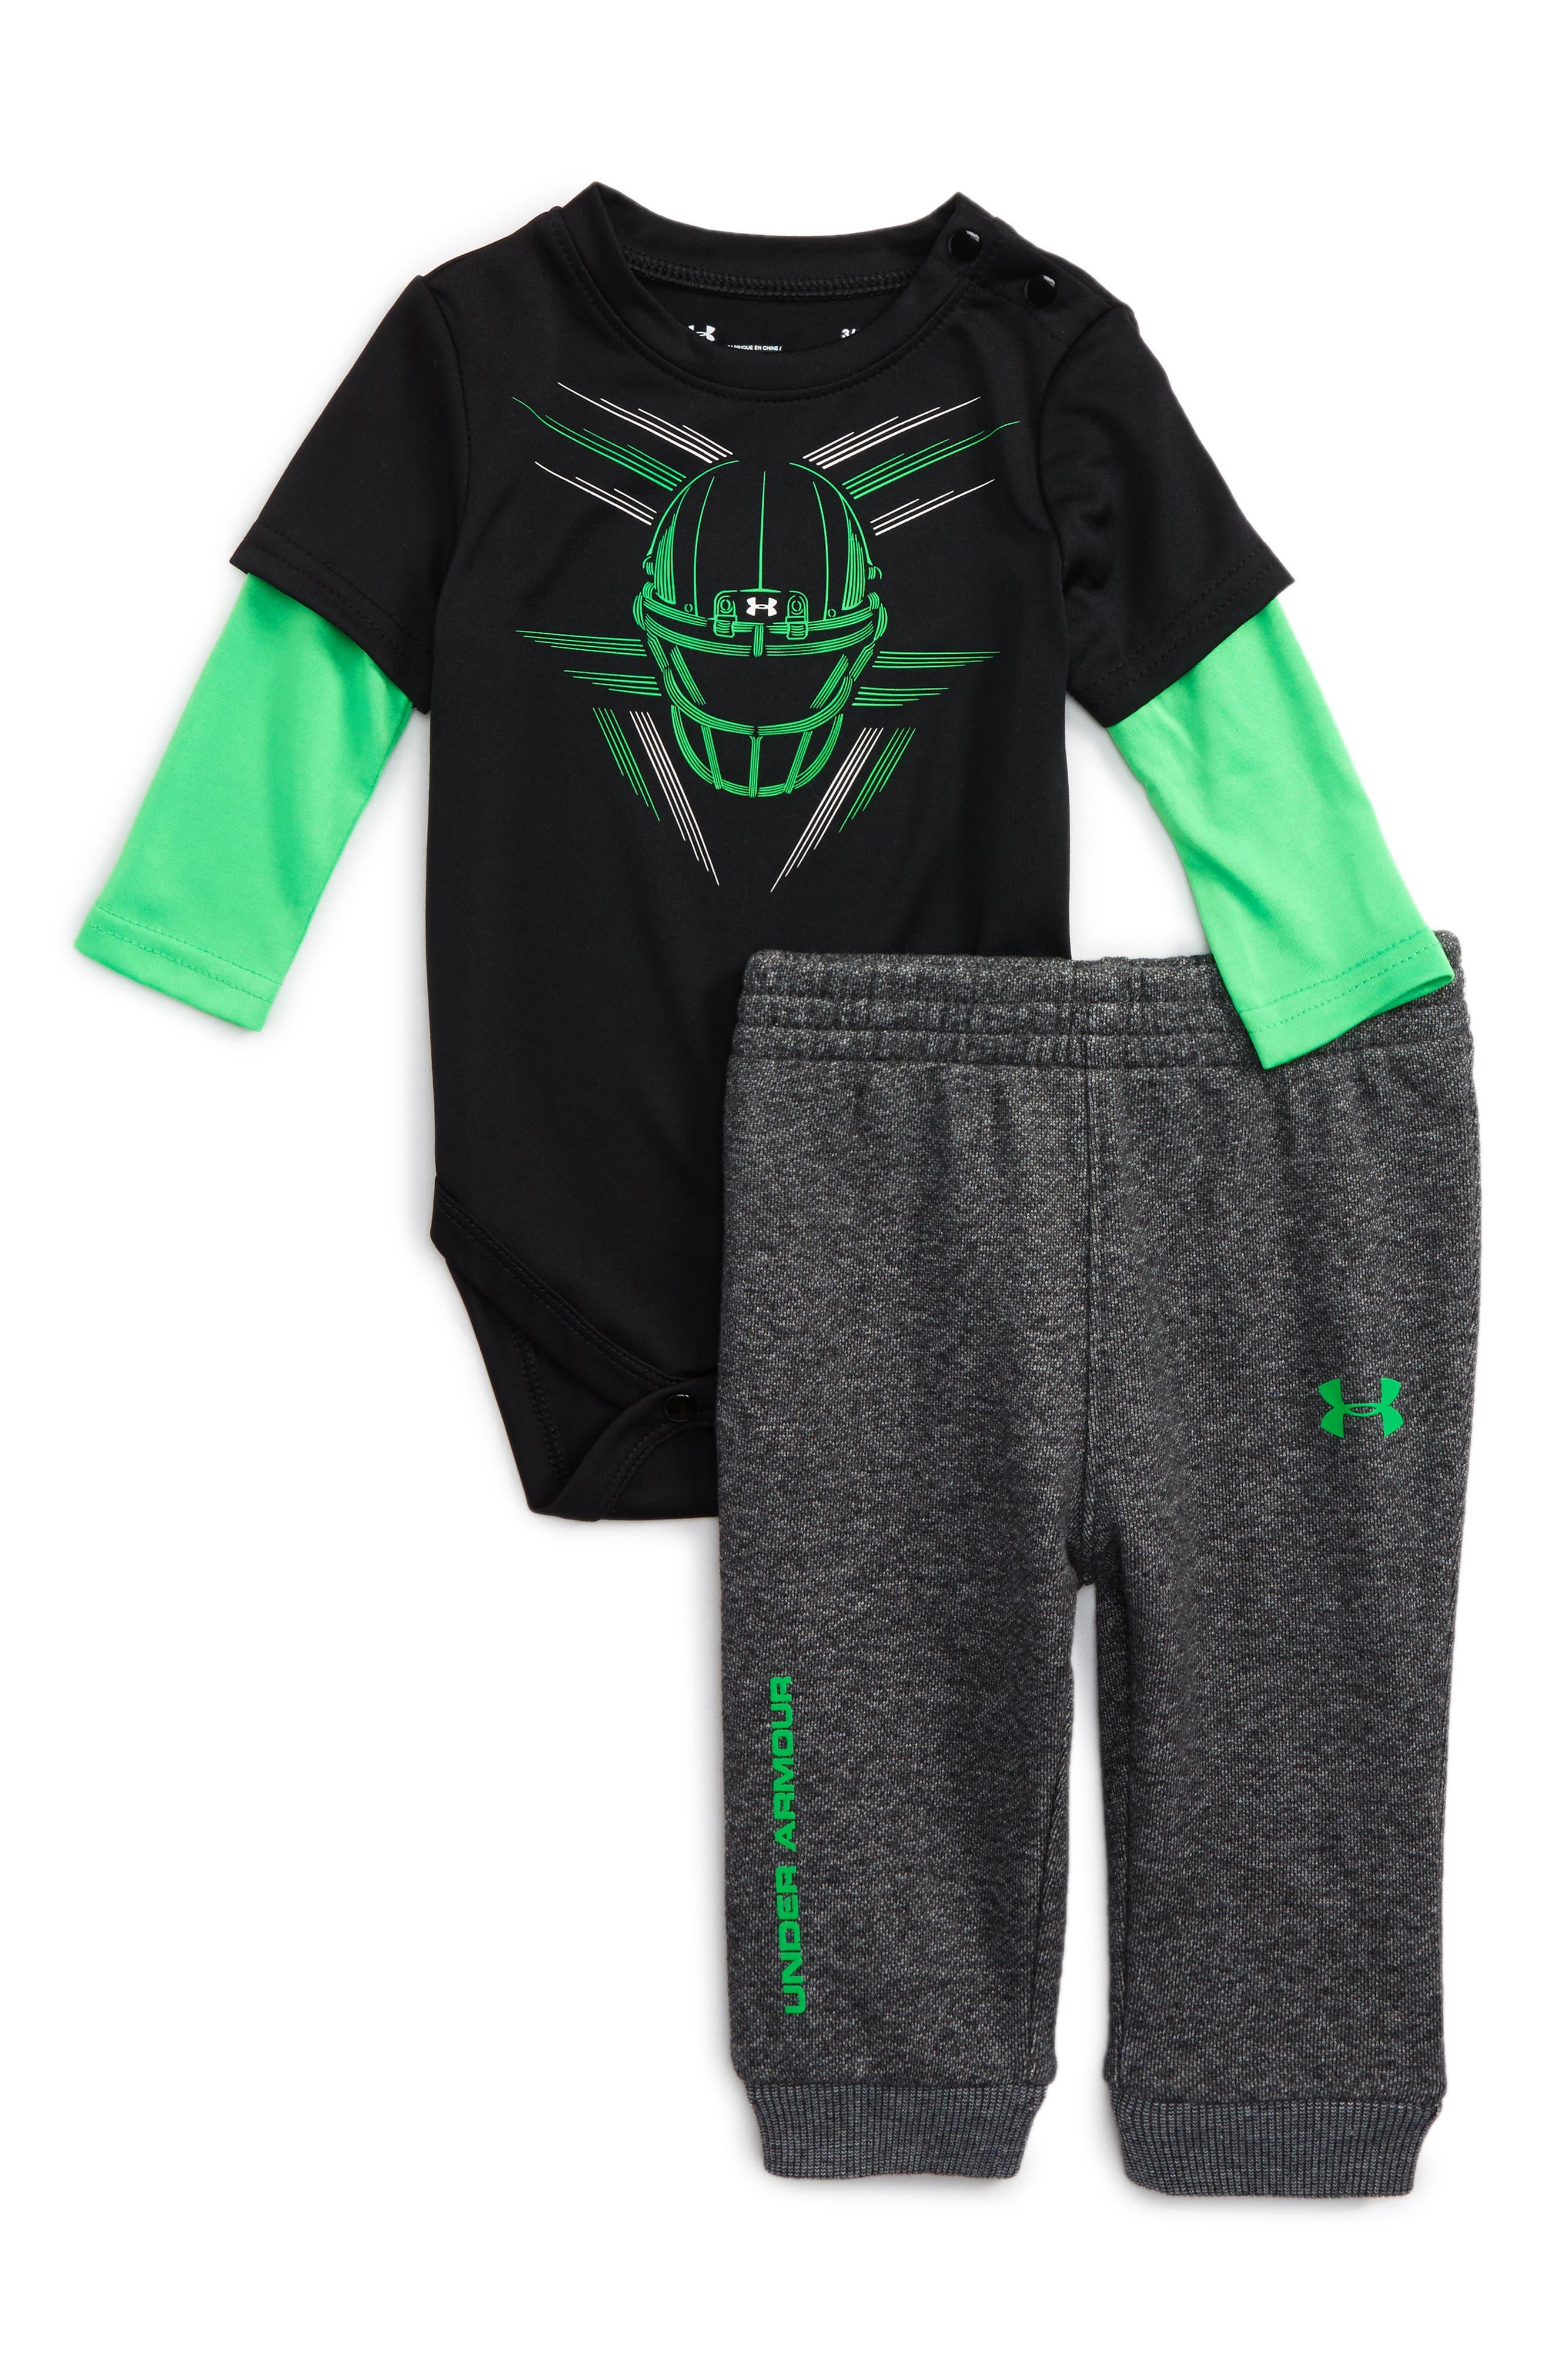 Alternate Image 1 Selected - Under Armour Digi Helmet Bodysuit & Pants Set (Baby Boys)